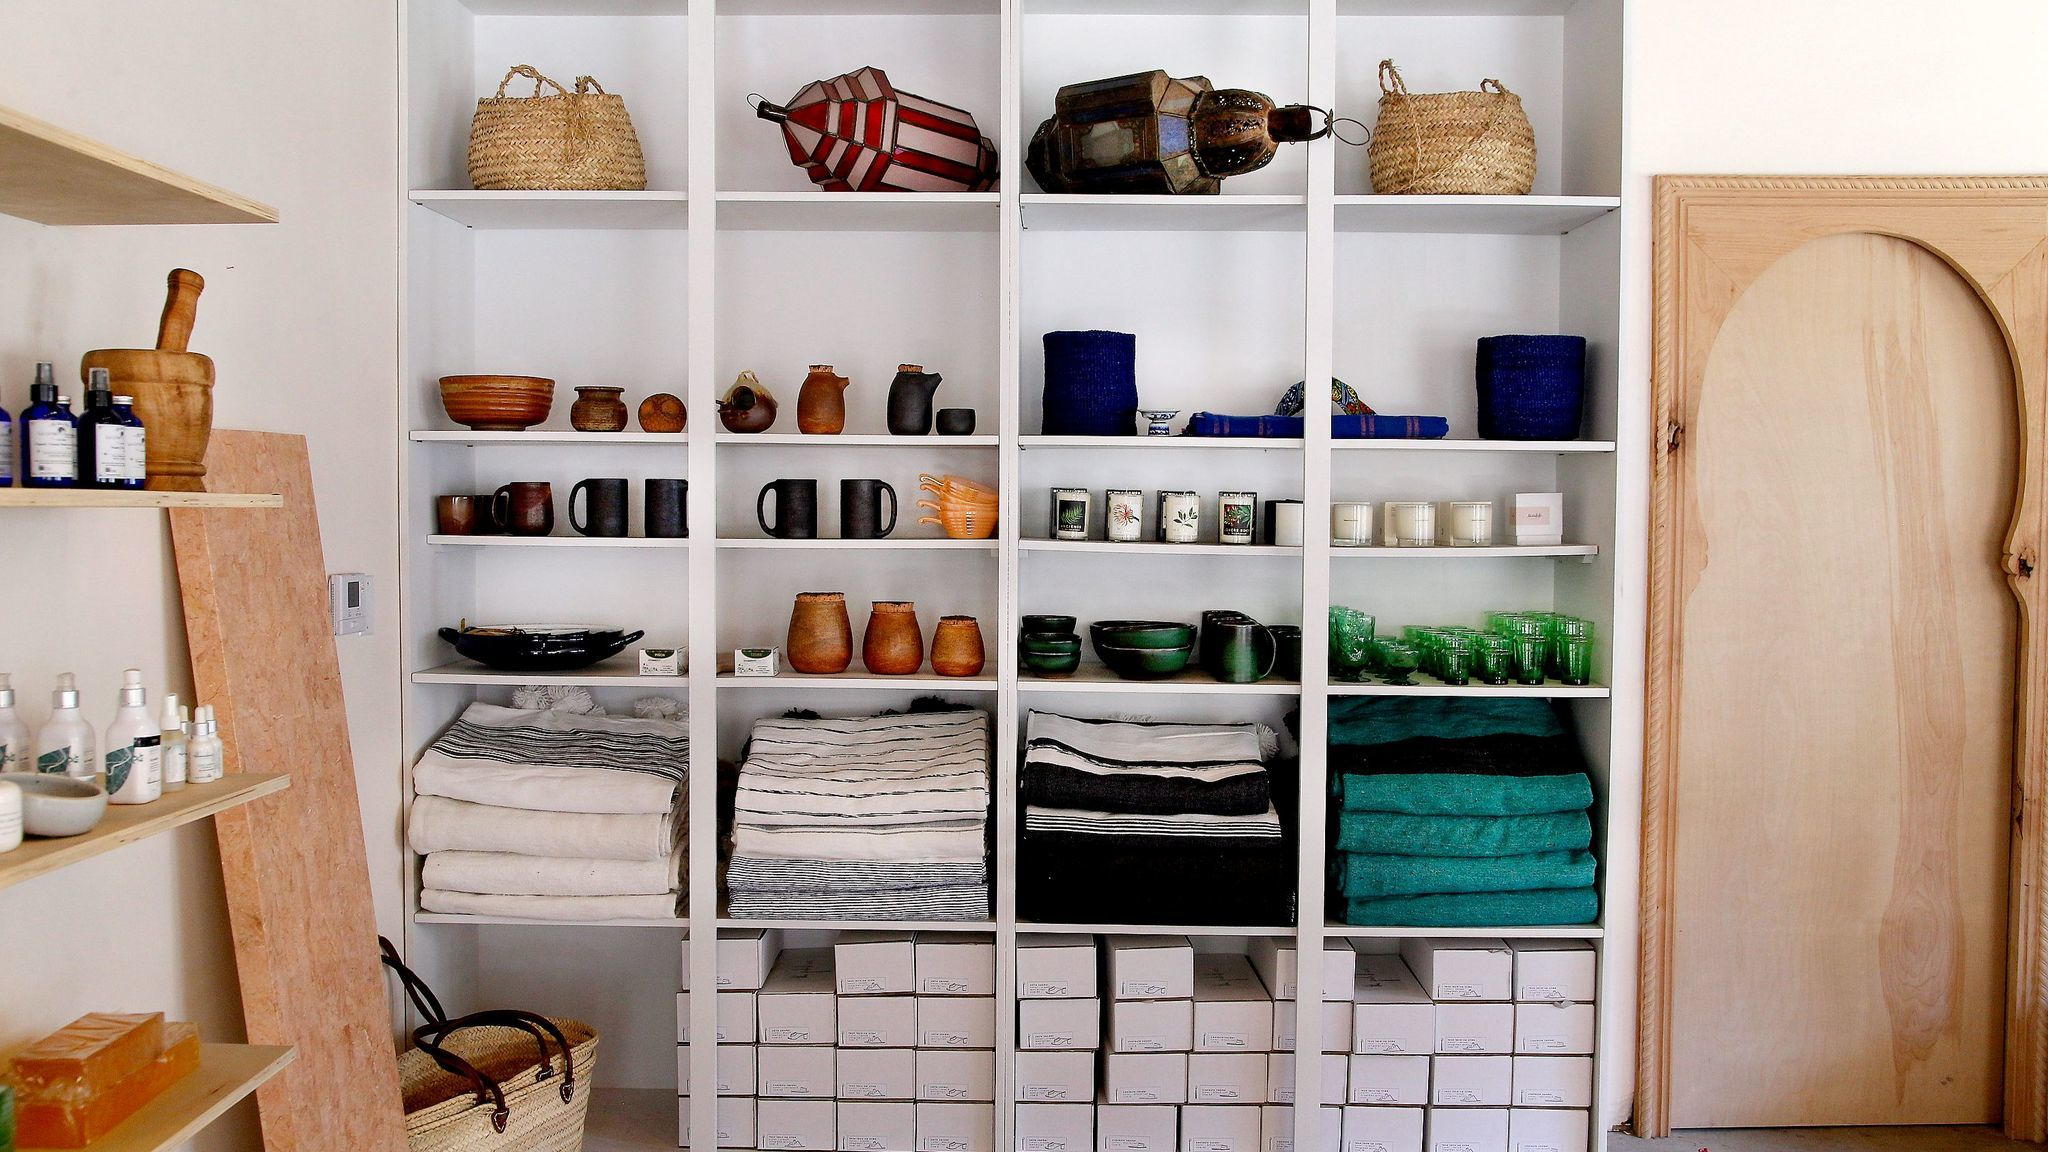 Some of the items on Marikoko's shelves.